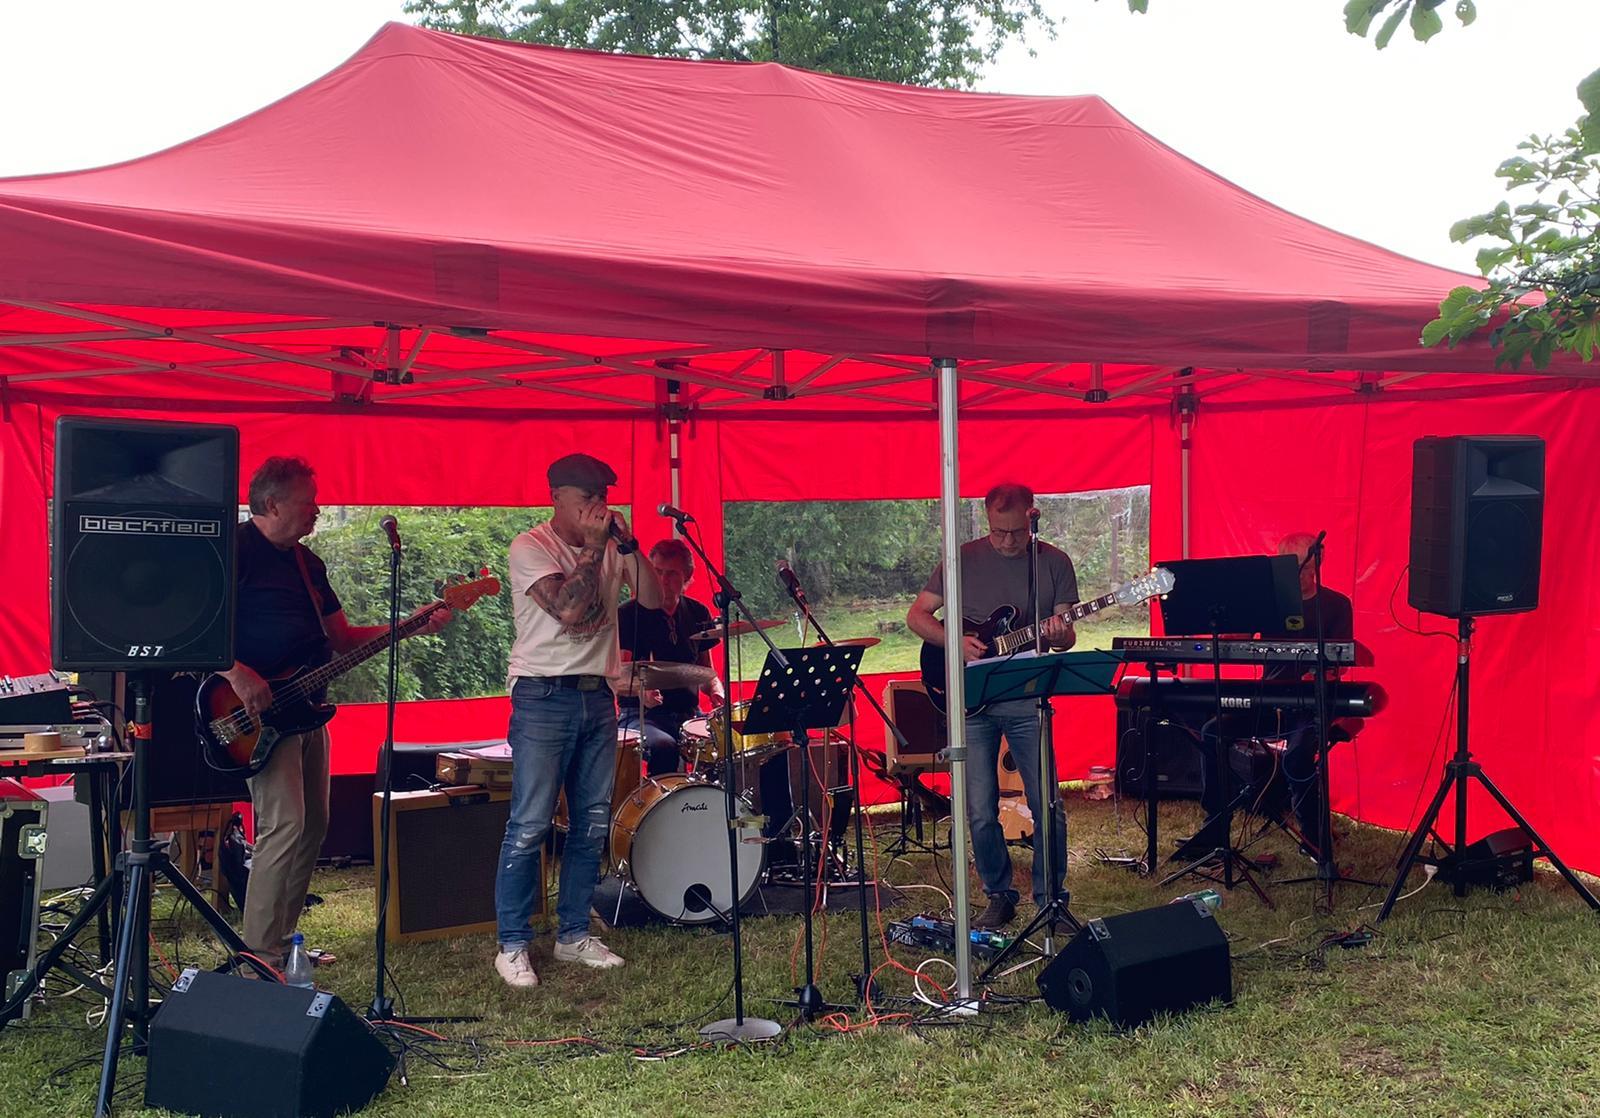 Gartenstuhlkonzert mit FEETZ Band